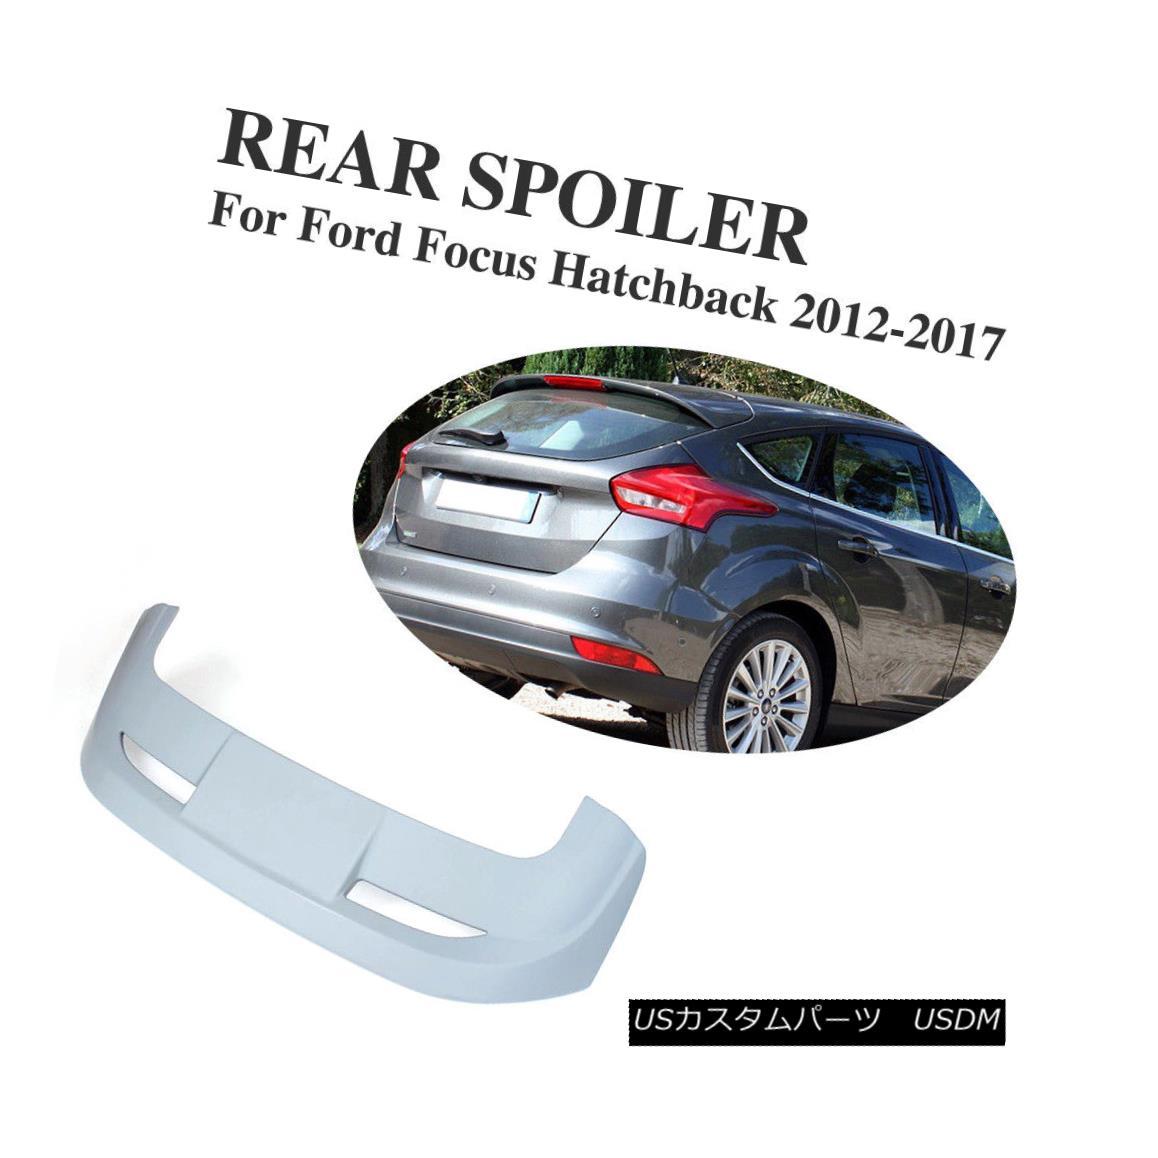 <title>車用品 バイク用品 >> パーツ 外装 エアロパーツ リアスポイラー ABS Rear Roof Spoiler Tail Trunk Wing Fit For NEW ARRIVAL Ford Focus Hatchback 2012-2017 フォードフォーカスハッチバックのためにフィットするABSリアルーフスポイラーテールトランクウィング2012-2017</title>